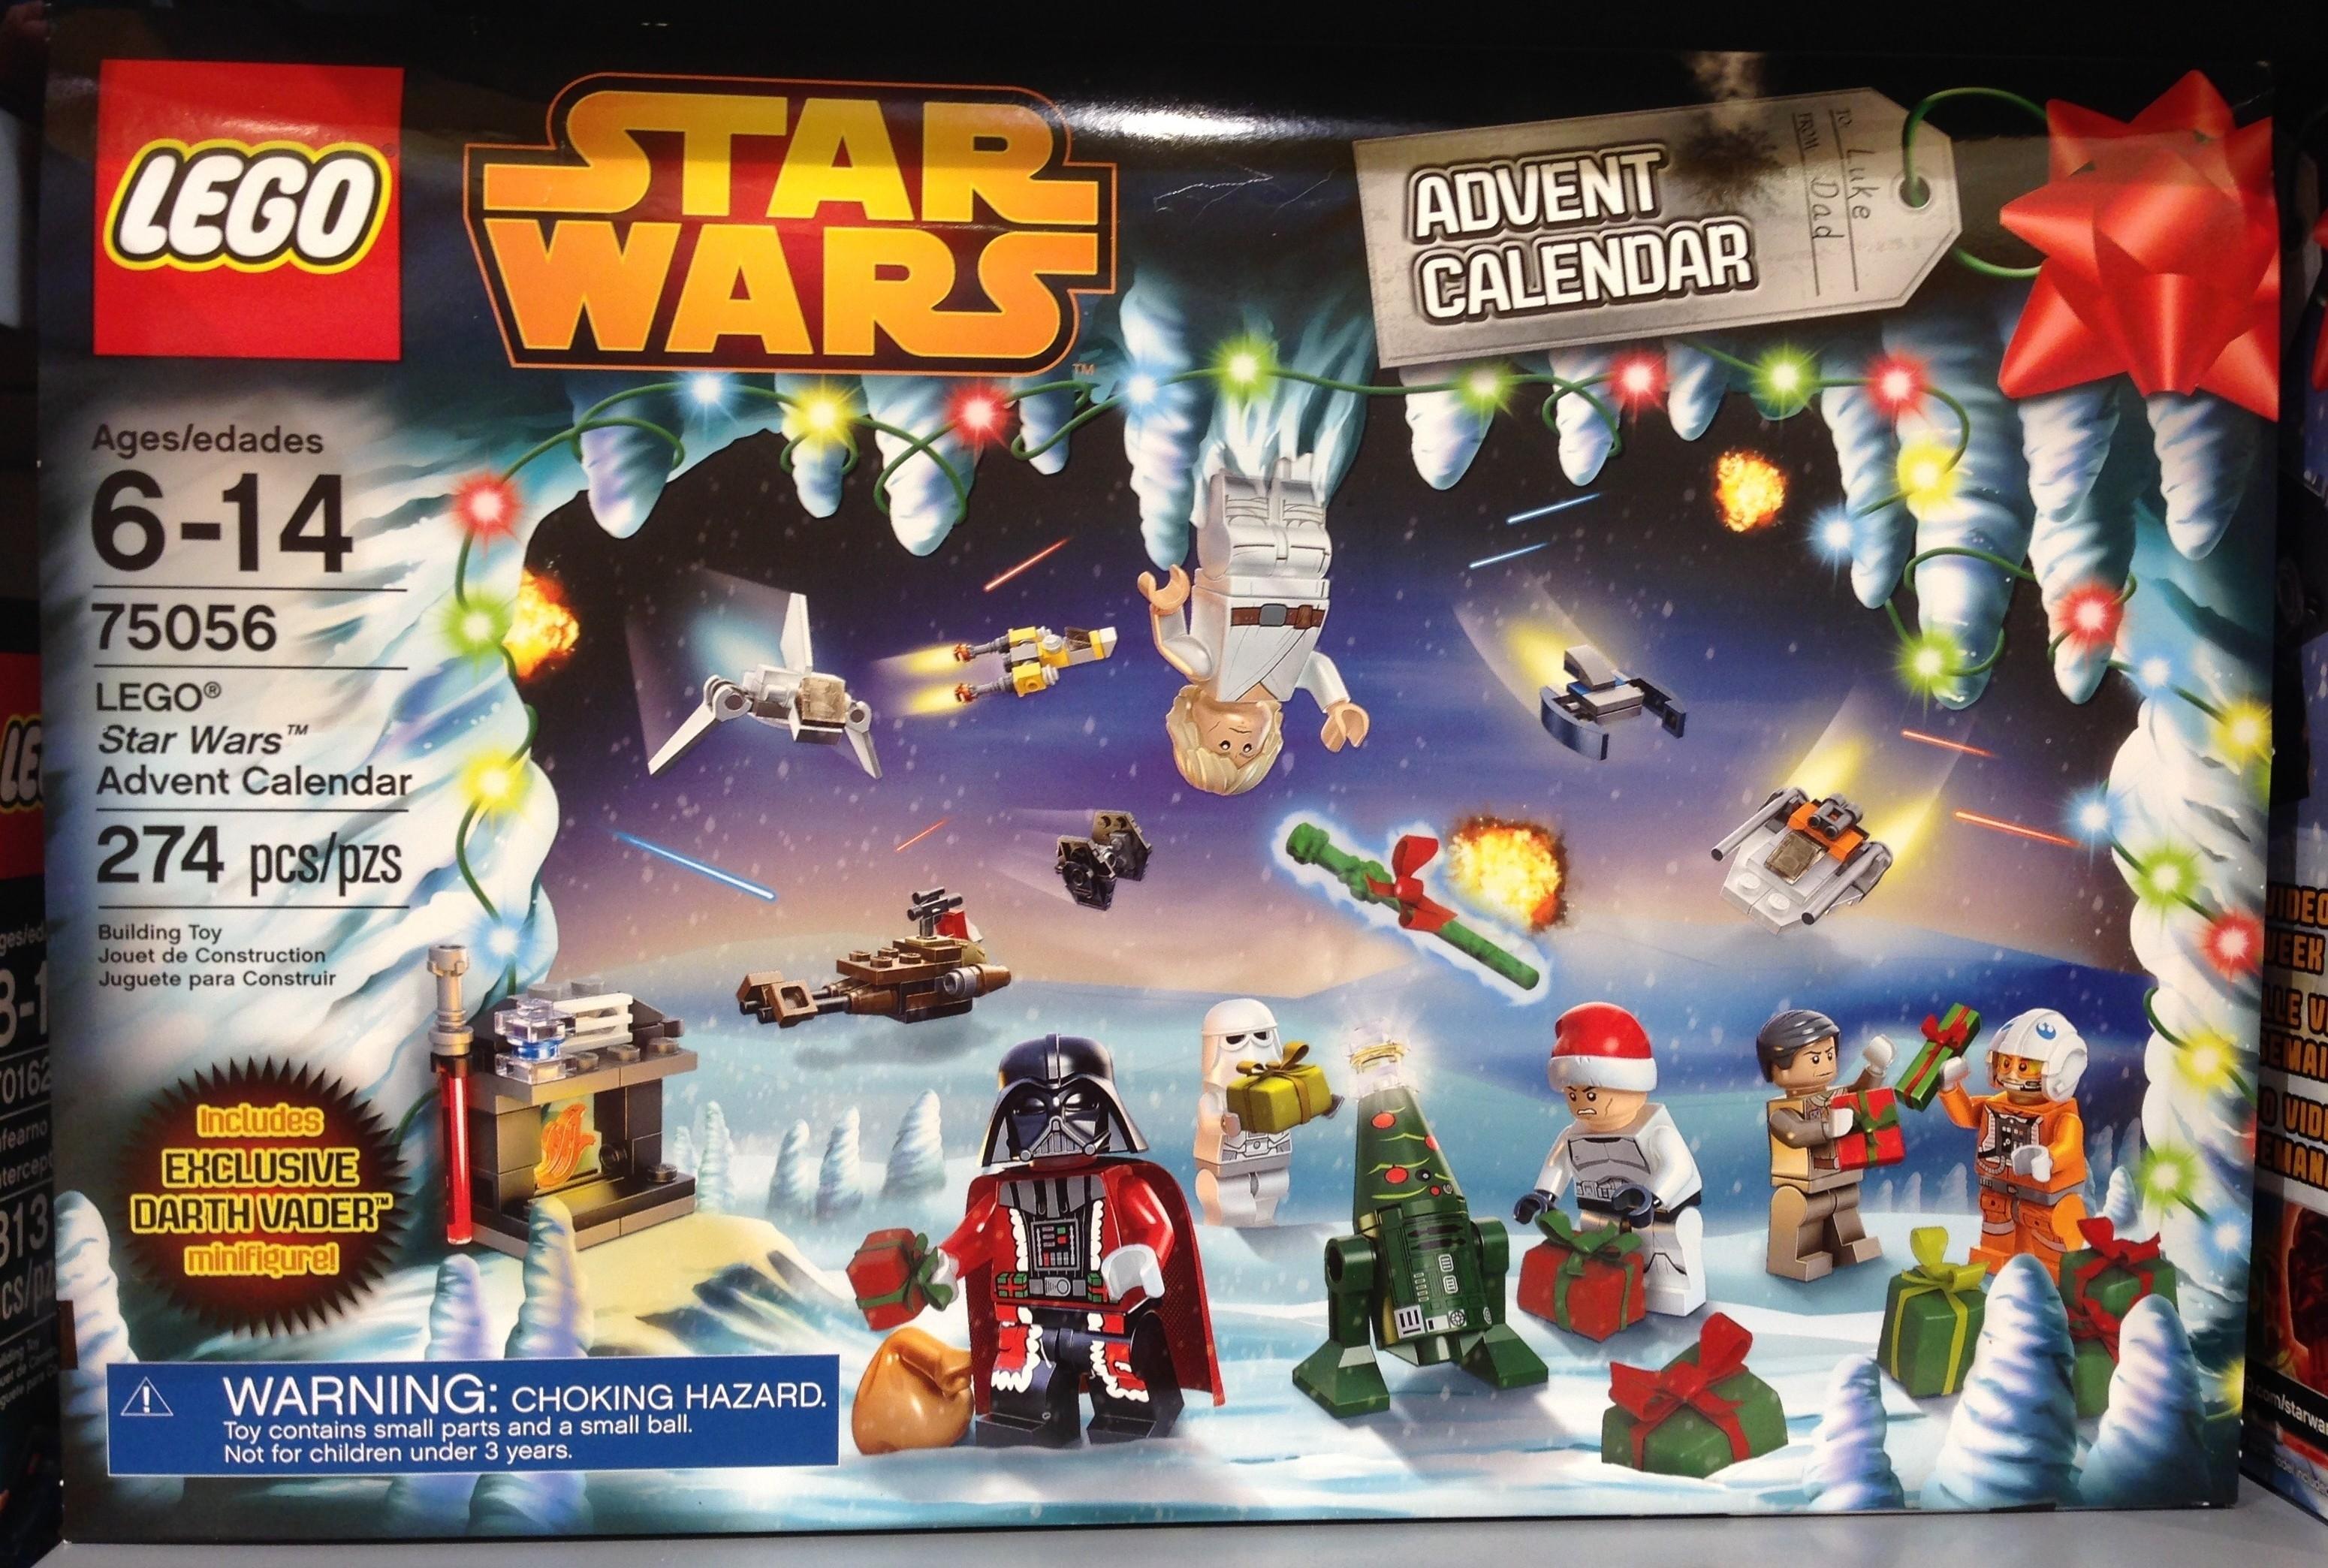 Magrudy - Toys for Star Wars 2013 Advent Calendar Codes